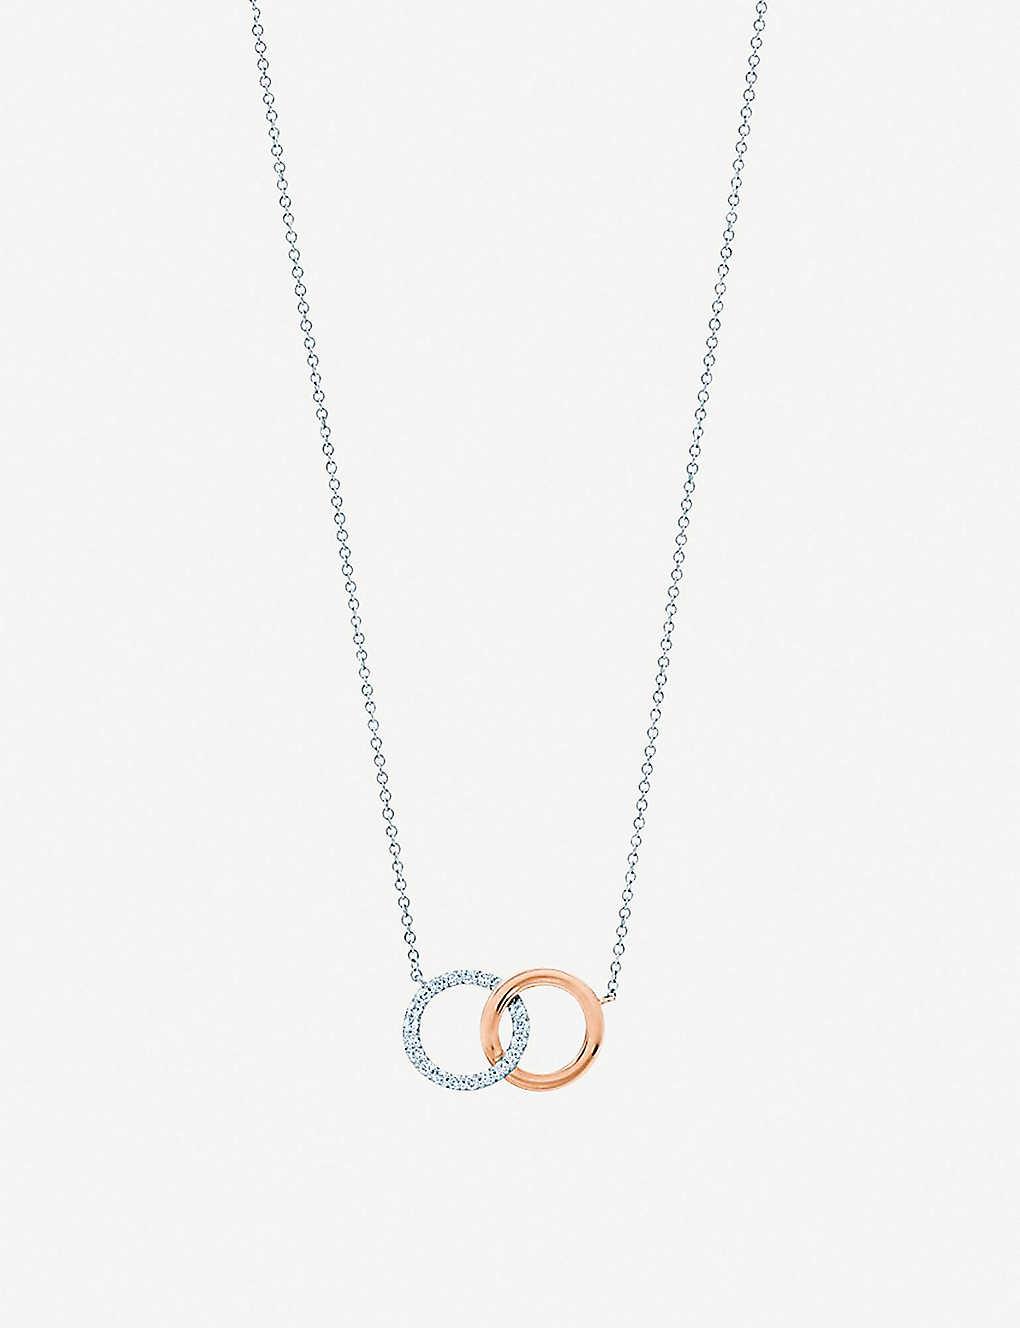 48c77444b TIFFANY & CO - Tiffany 1837 interlocking circles 18ct rose-gold and ...